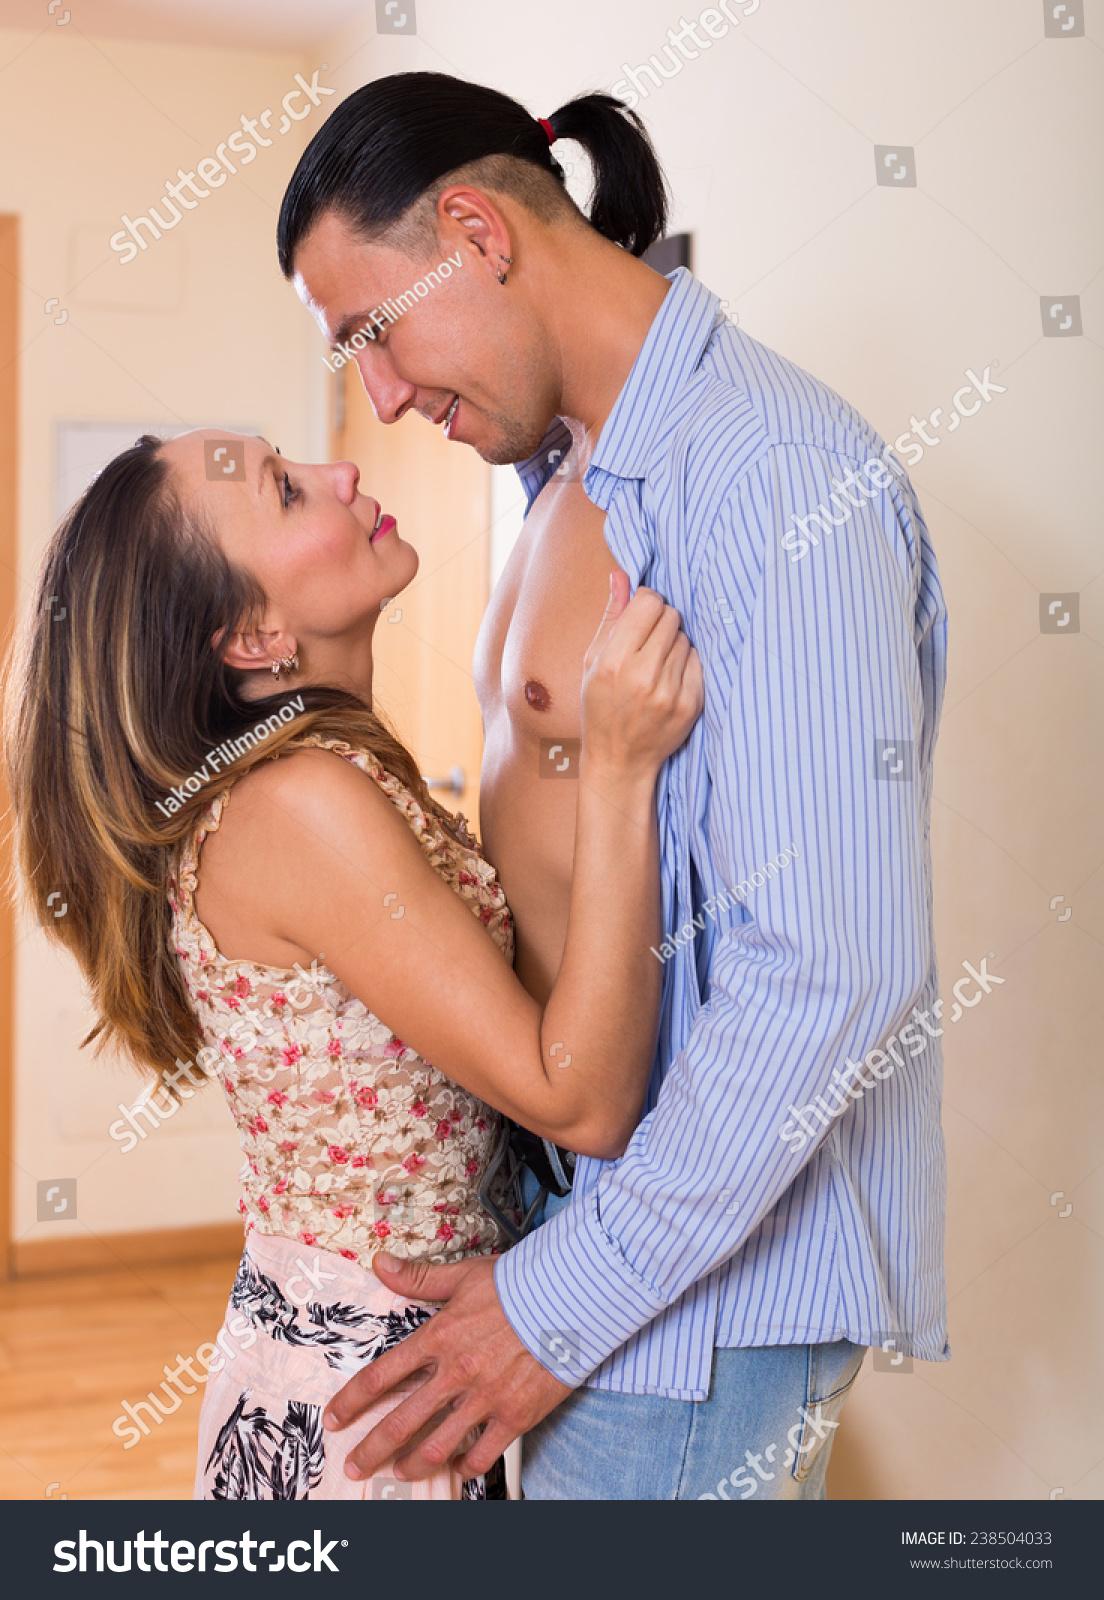 29yo girl makes love to cute girlnextdoor 2